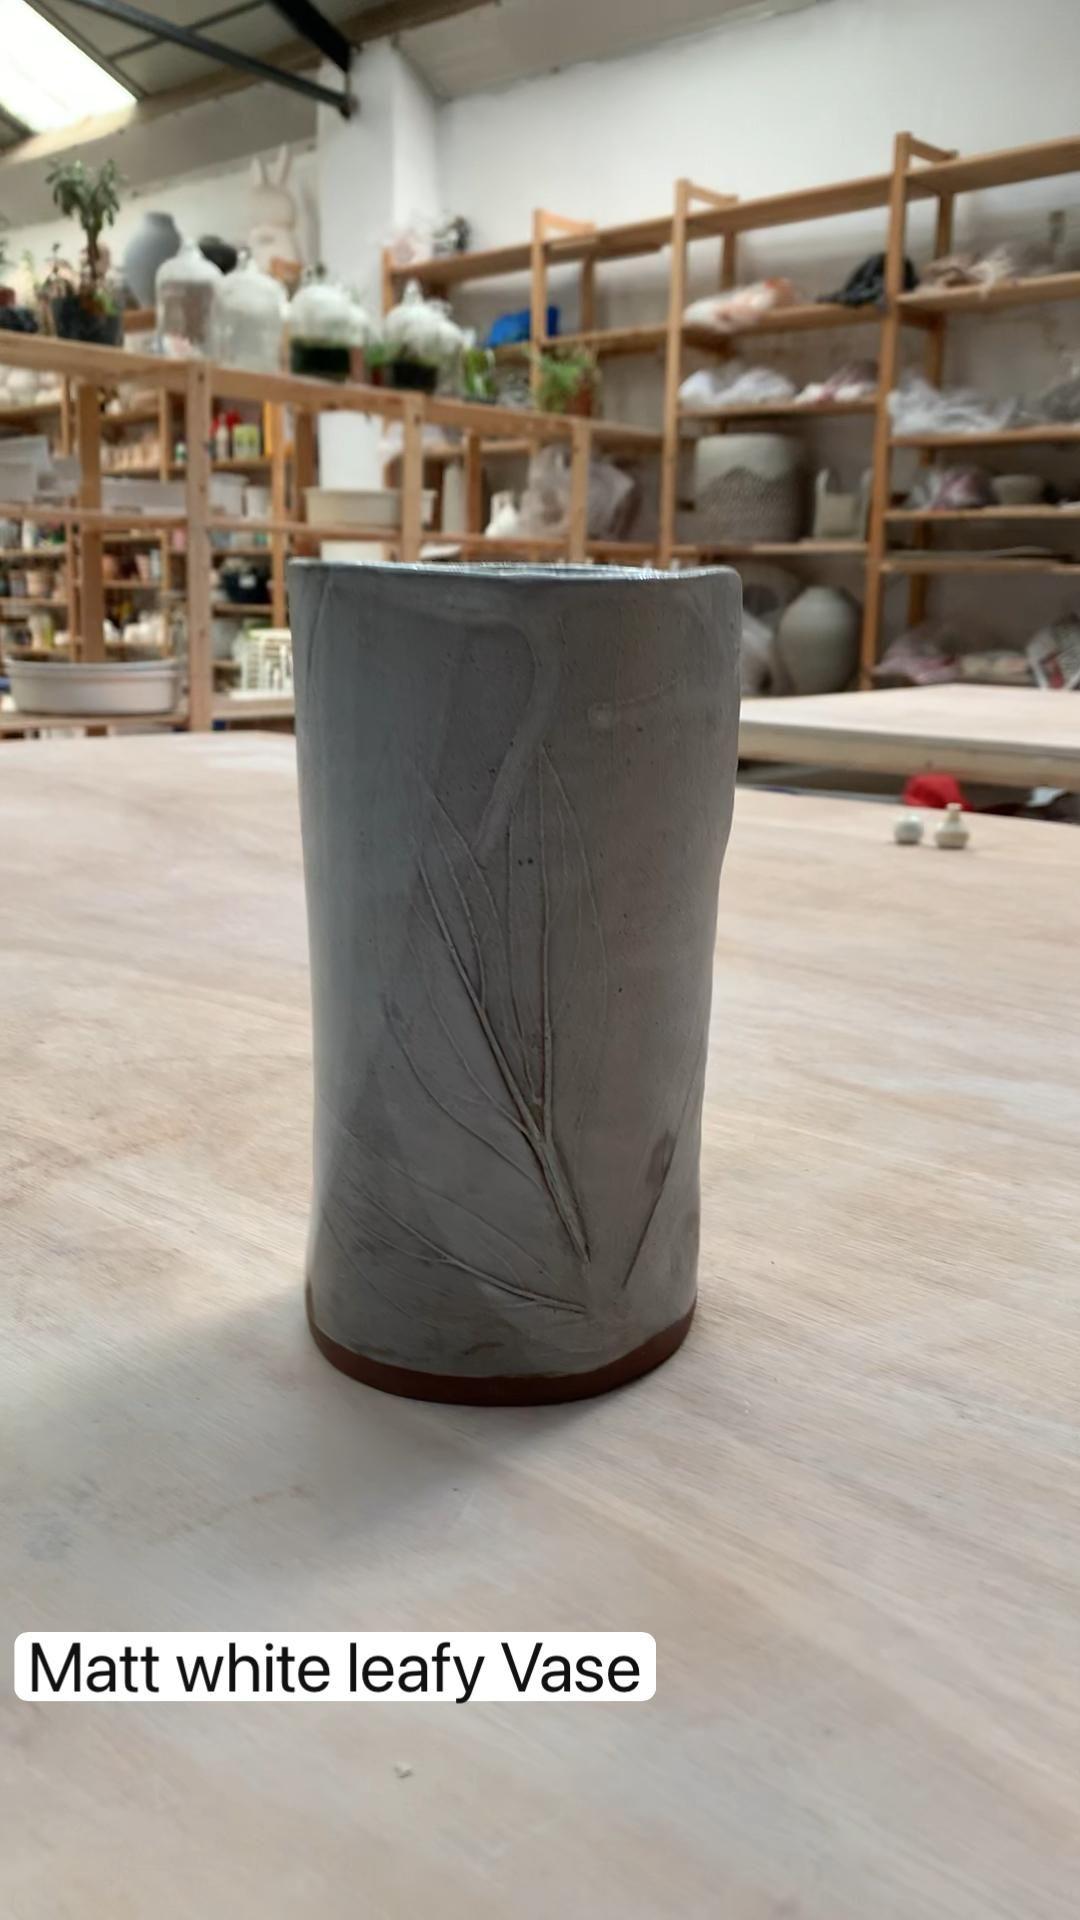 Matt white leafy Vase